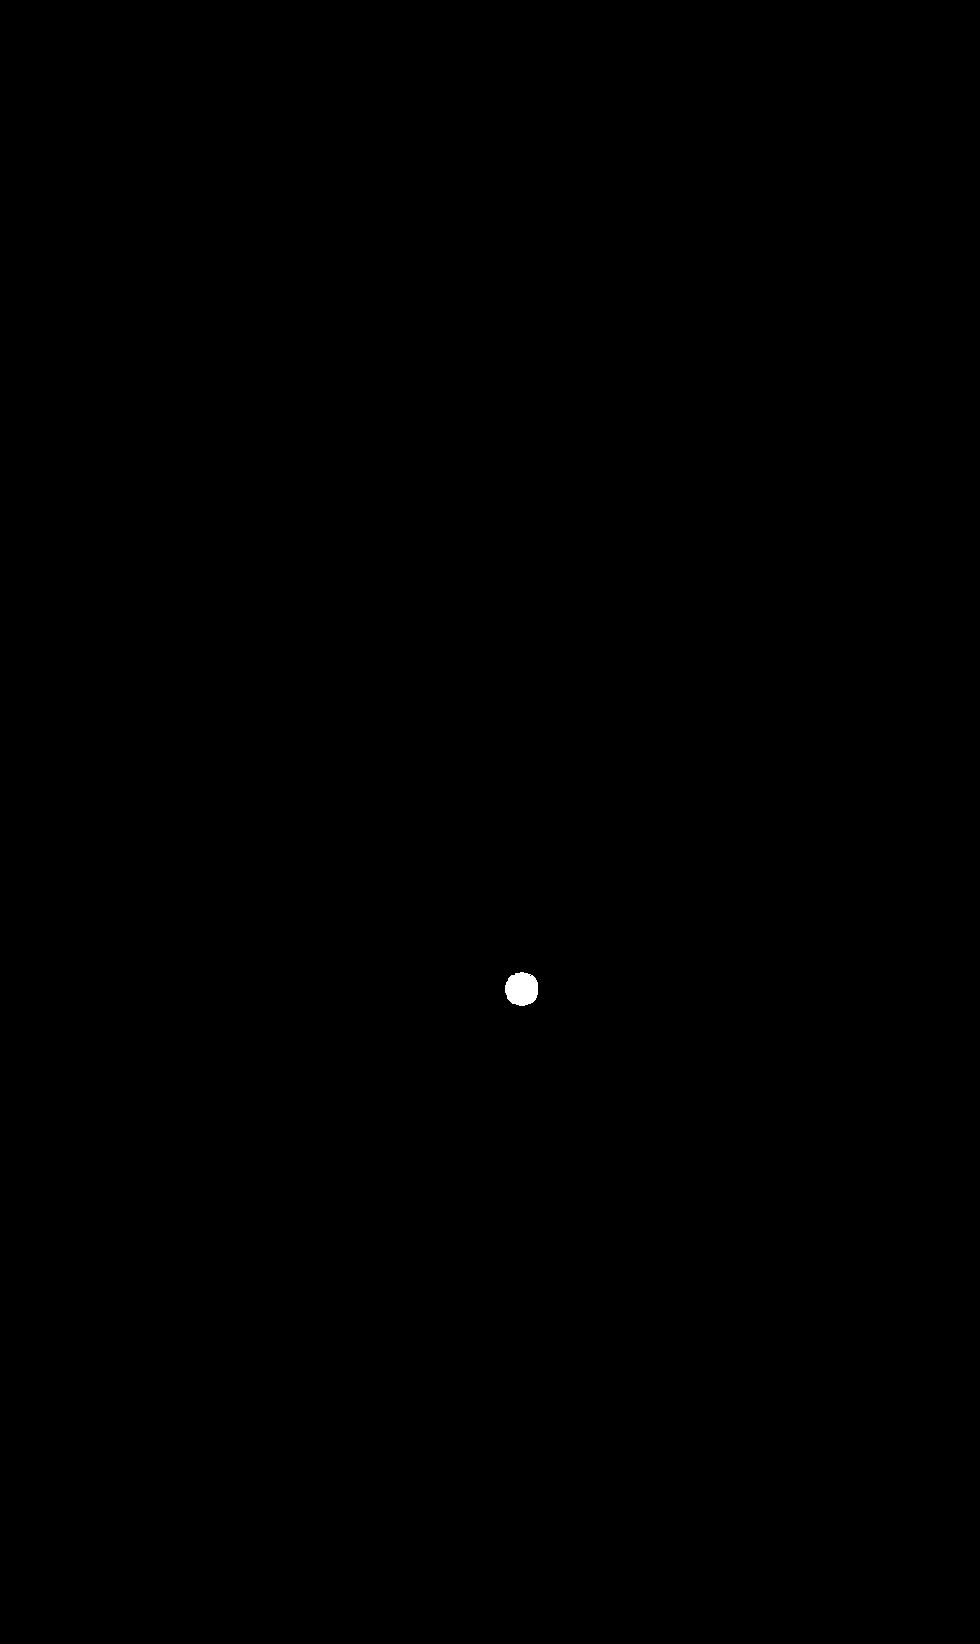 Linktia_Profile copy 7.png